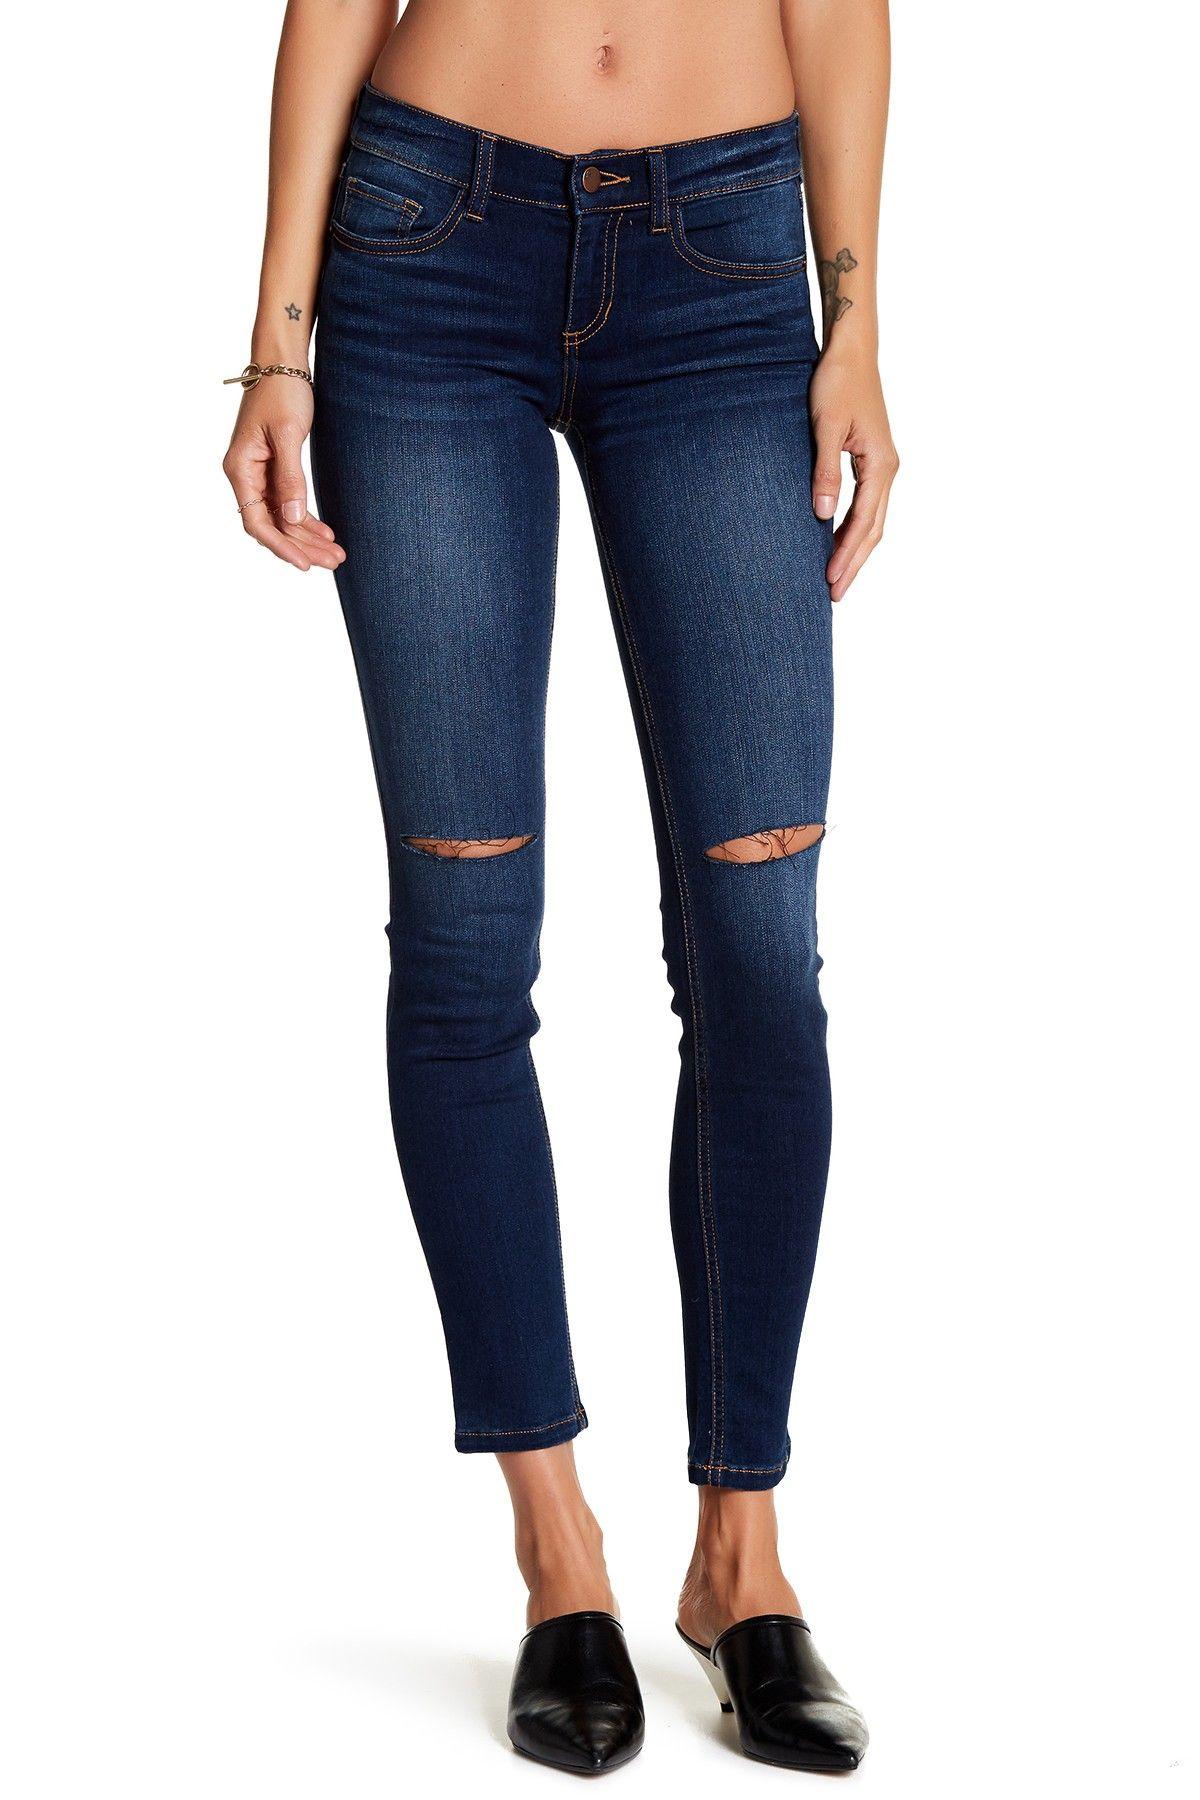 Low Rise Slit Knee Skinny Jean